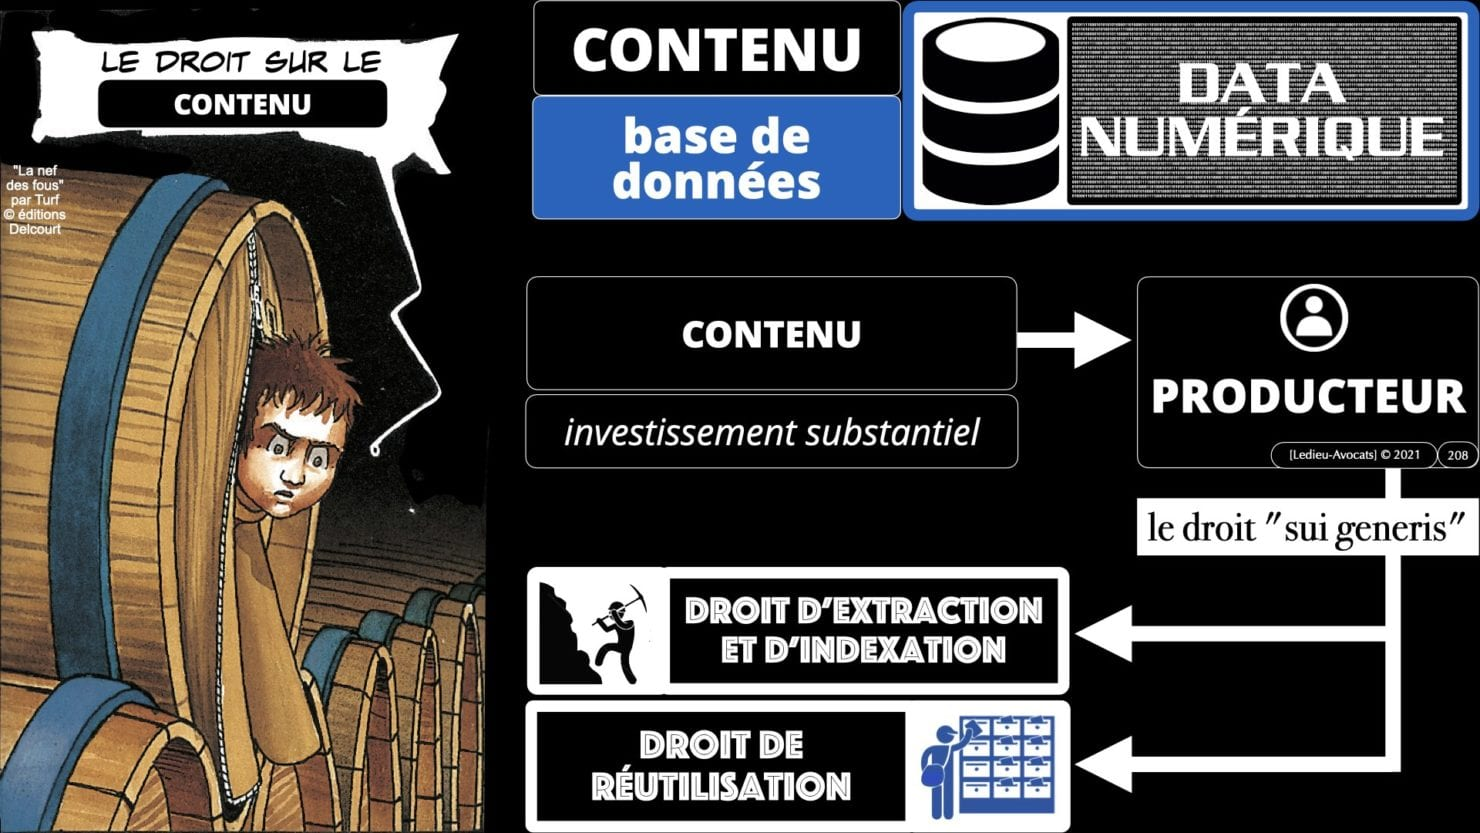 RGPD e-Privacy principes actualité jurisprudence ©Ledieu-Avocats 25-06-2021.208